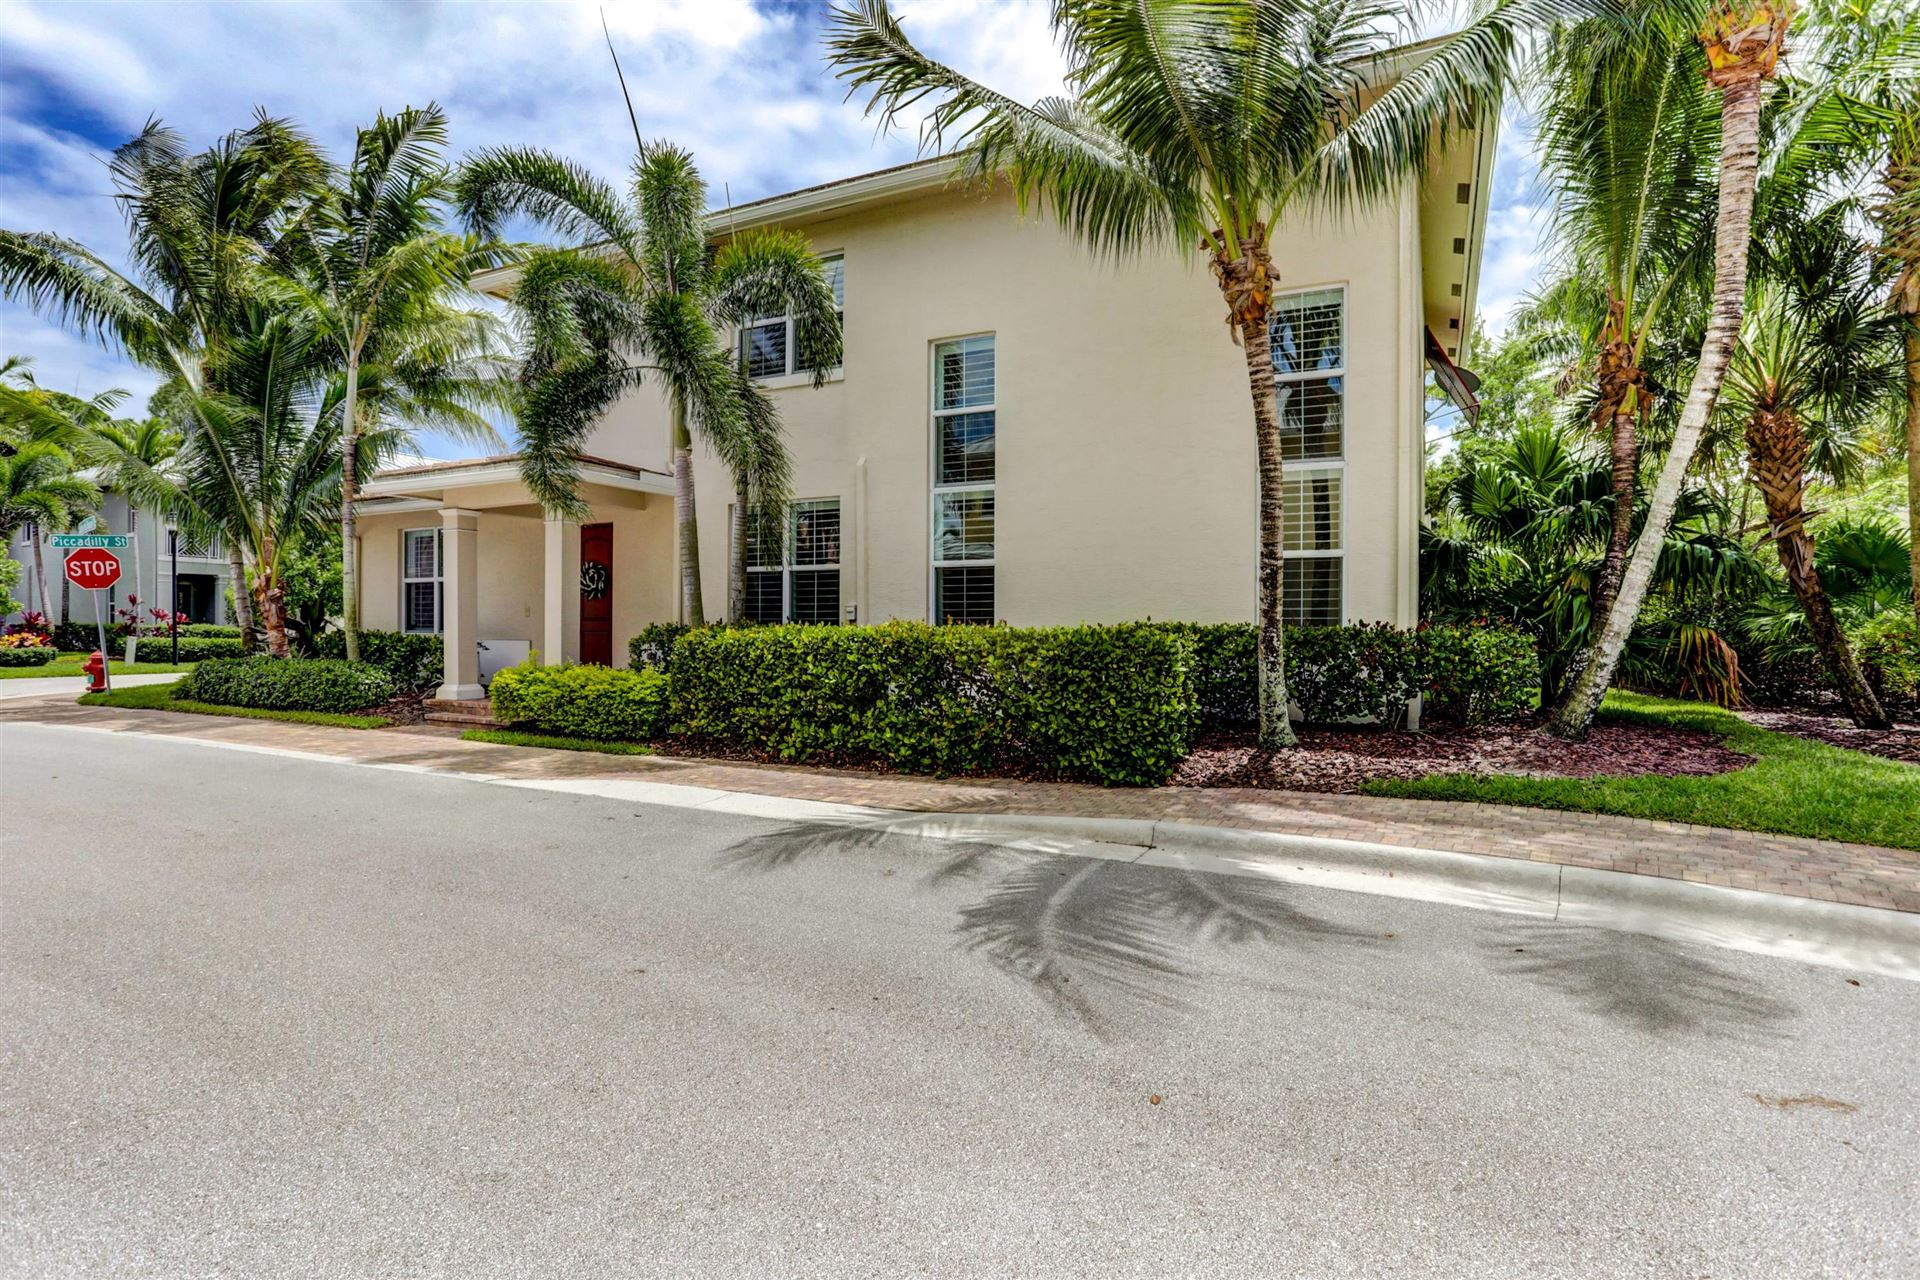 Photo of 1045 Piccadilly St. Street, Palm Beach Gardens, FL 33418 (MLS # RX-10716443)